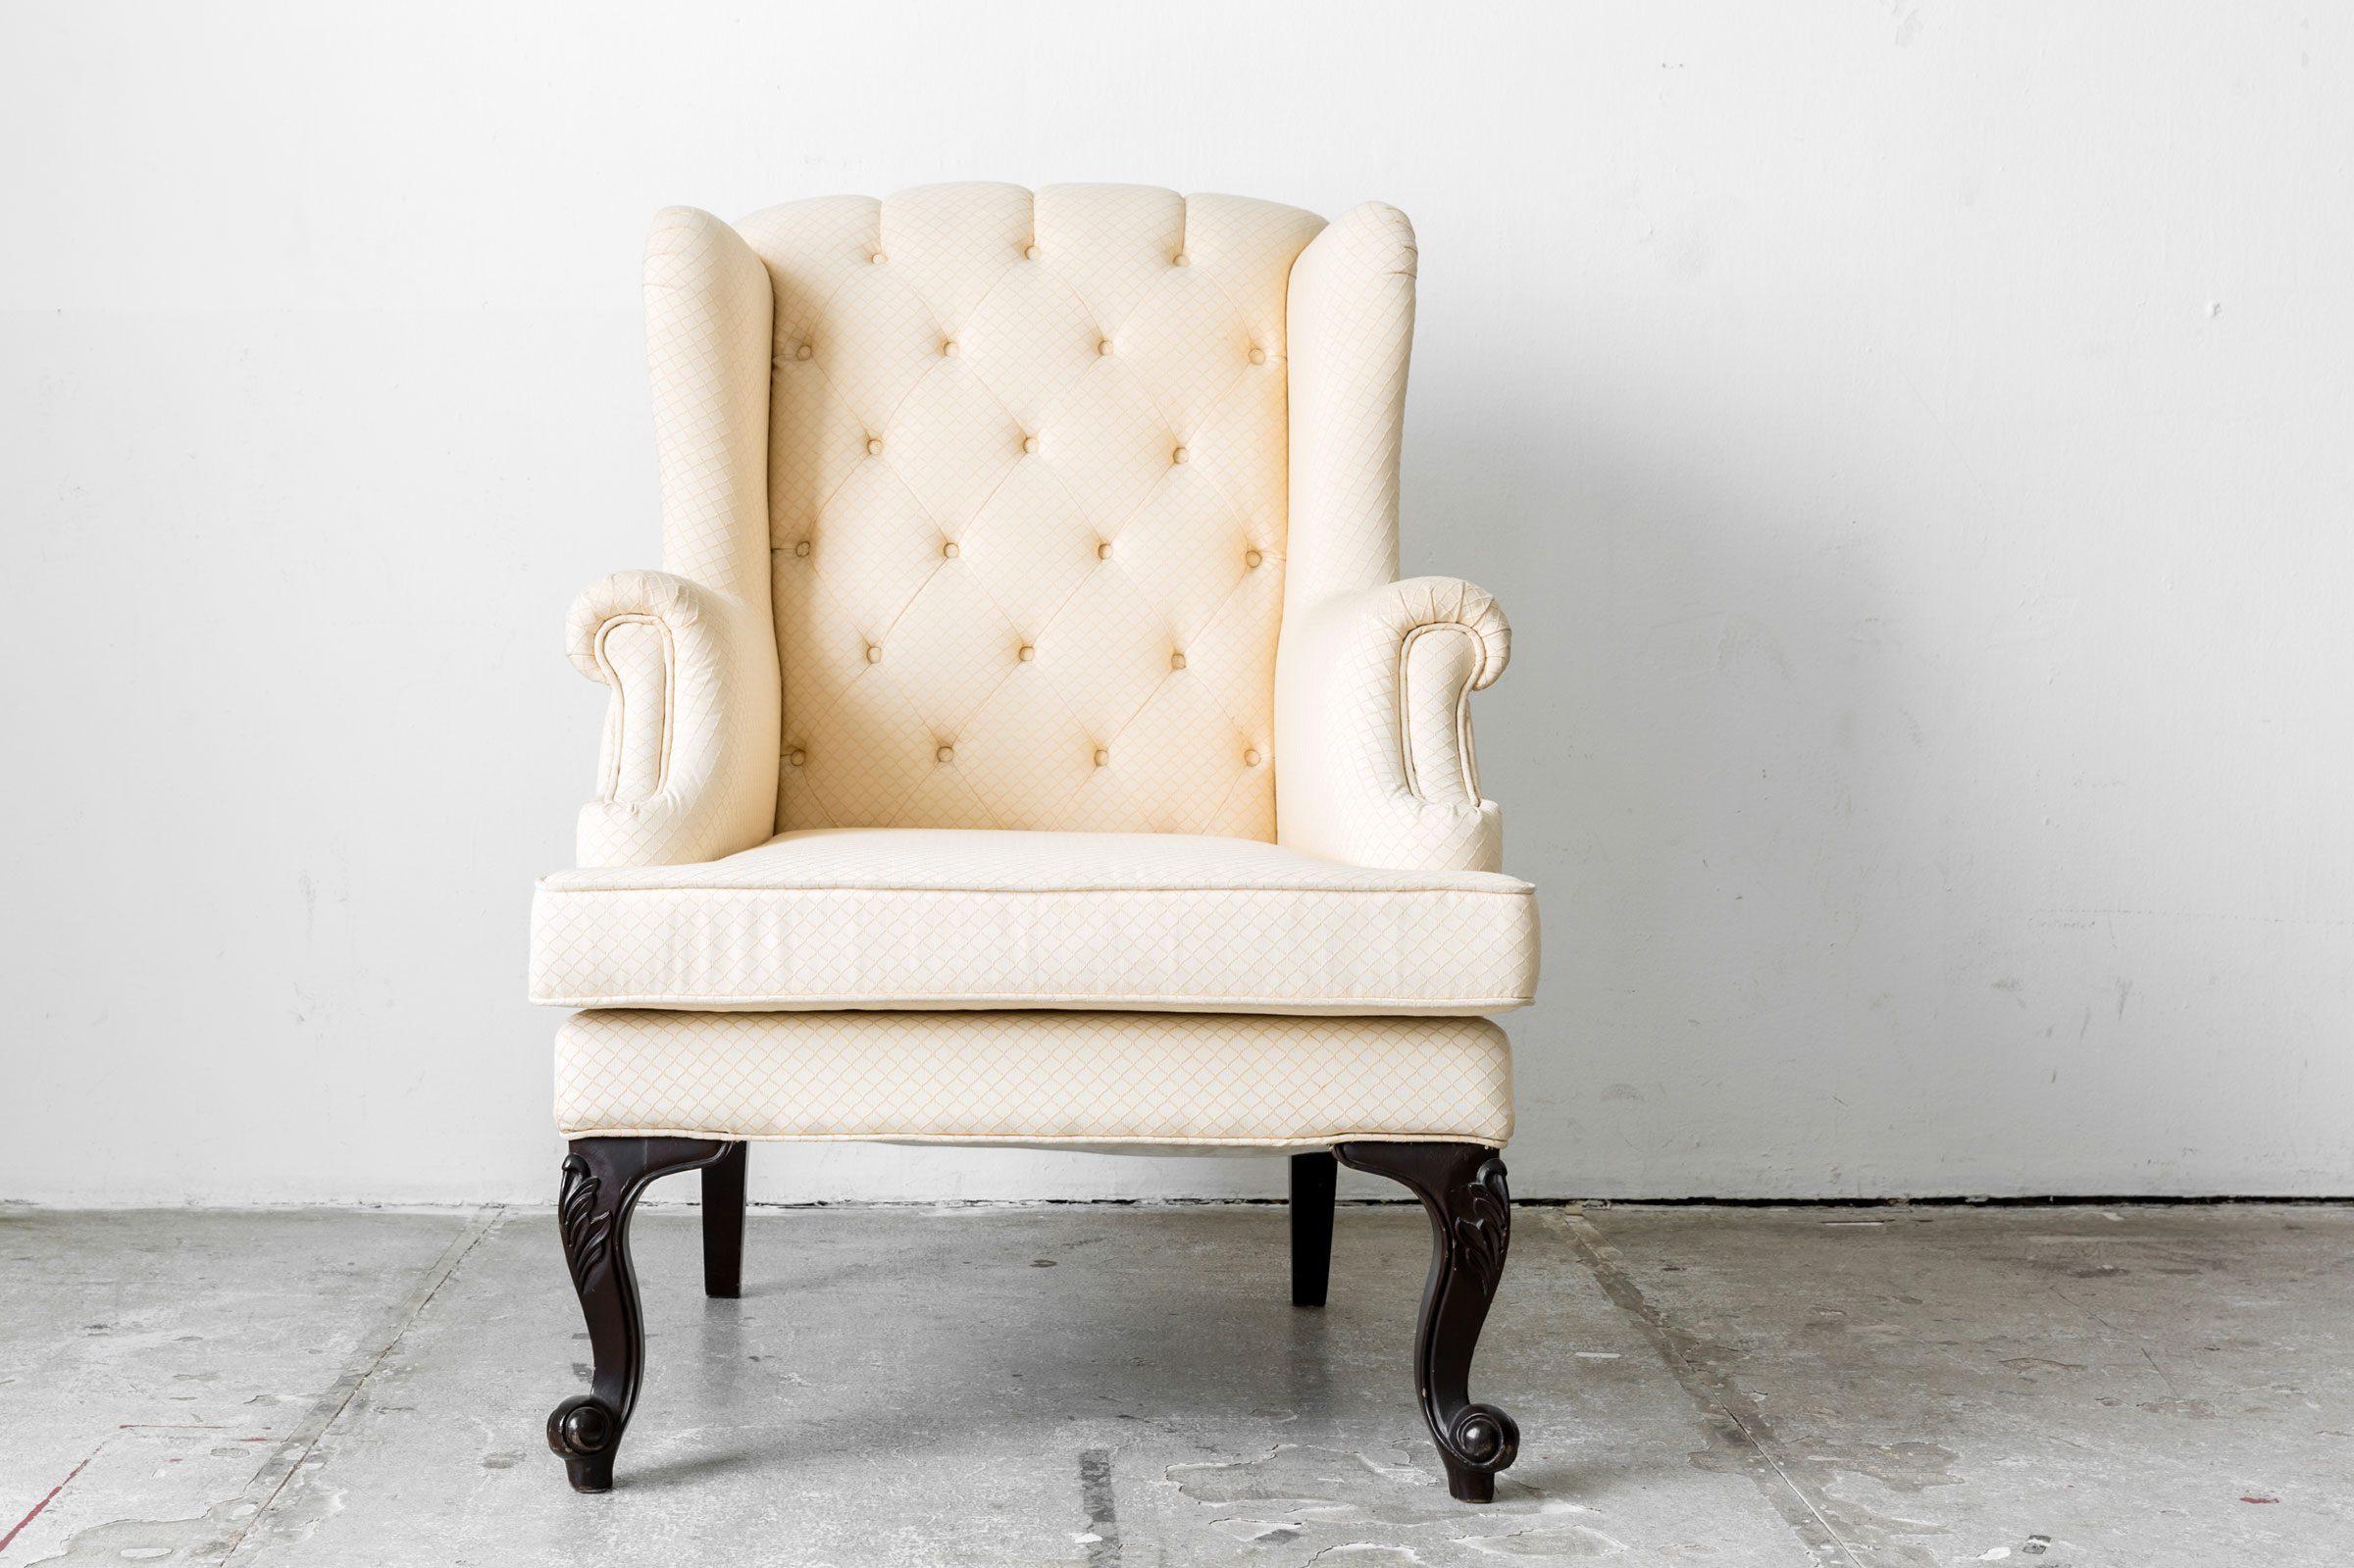 21 things you should never buy at garage sales reader s digest upholstered furniture